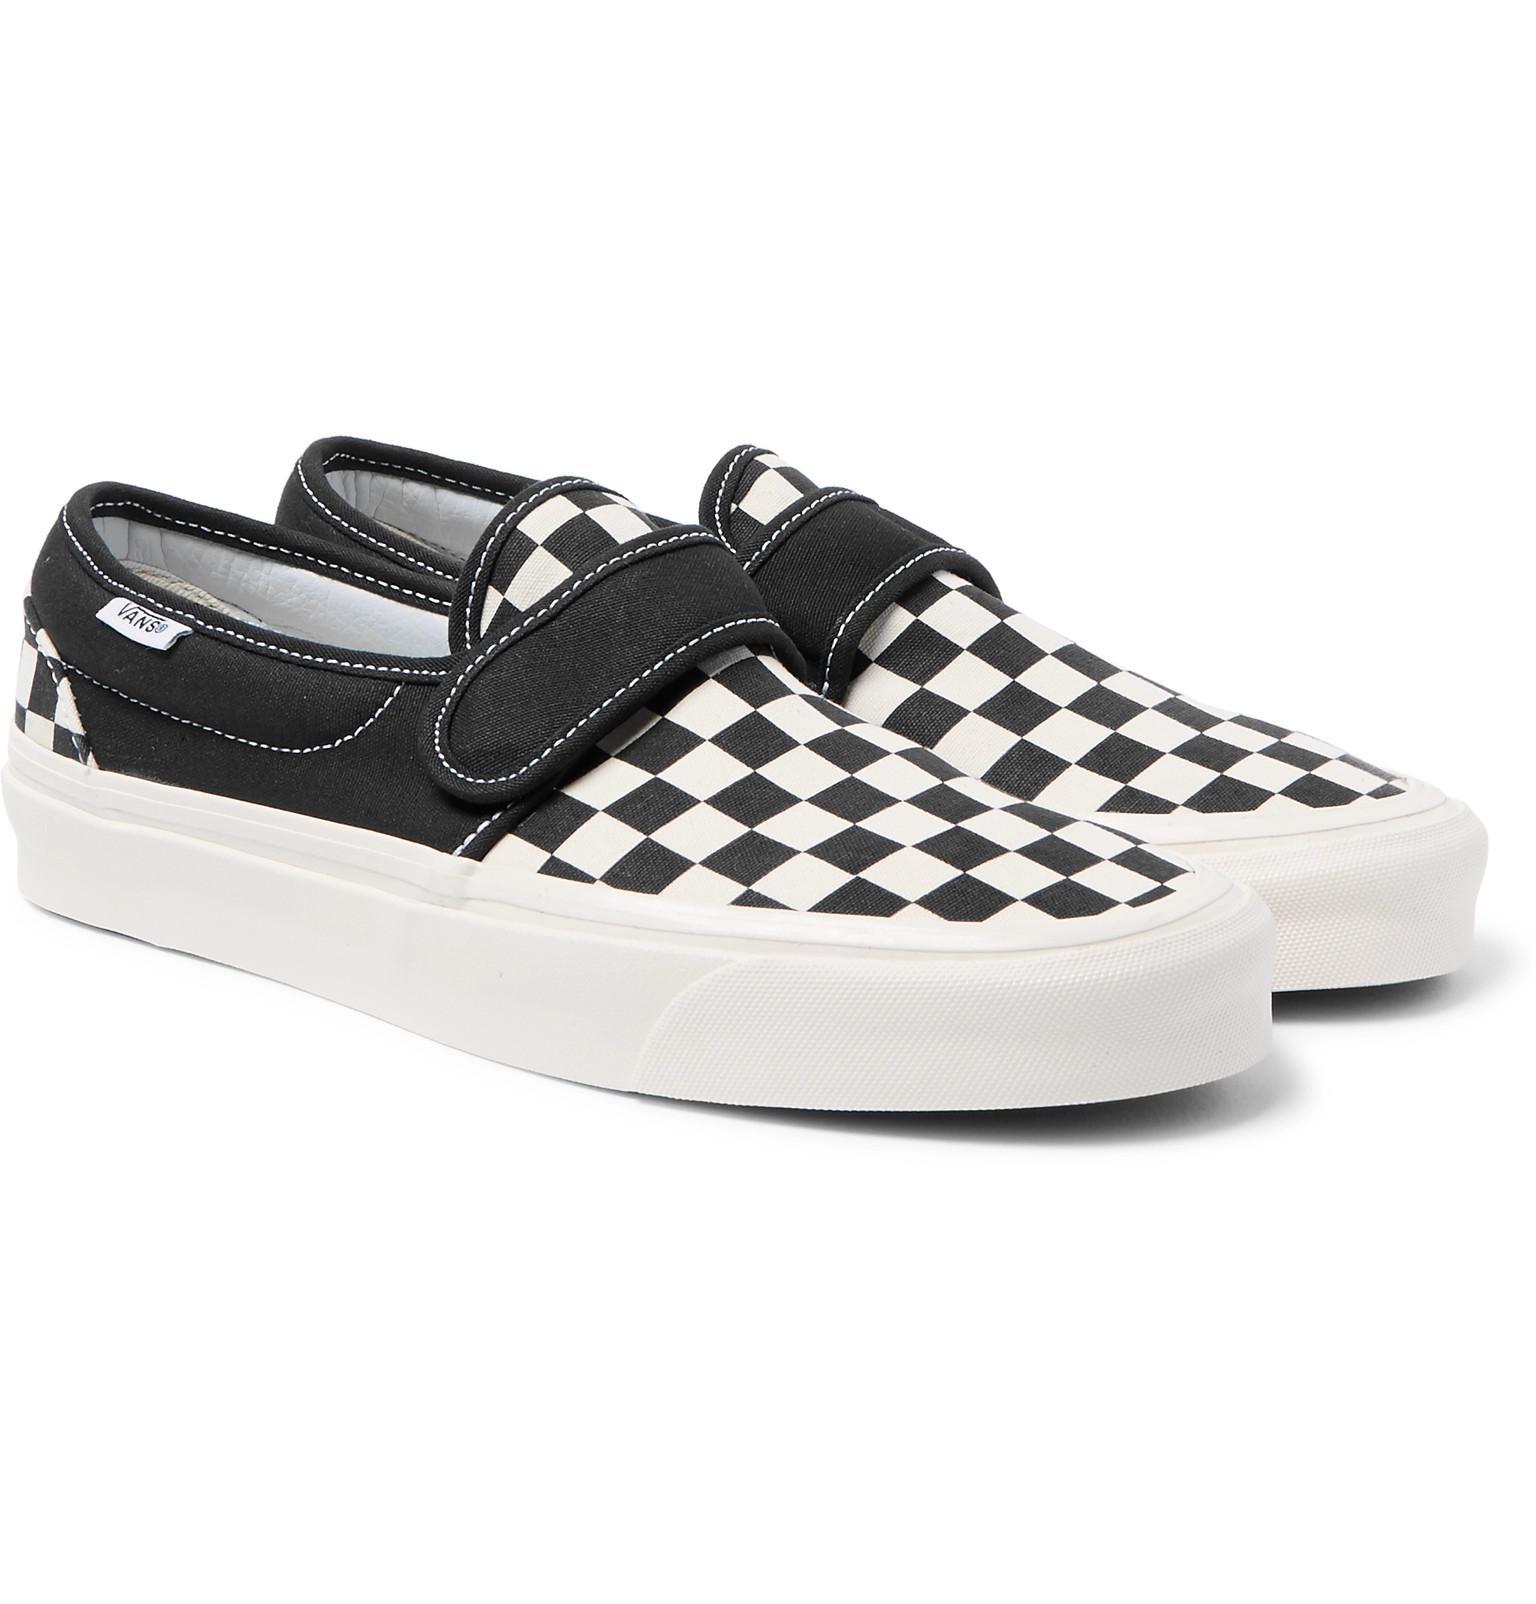 70bdec00c22a Vans Slip-on 47 V Dx Anaheim Factory Pack Sneakers in Black for Men ...